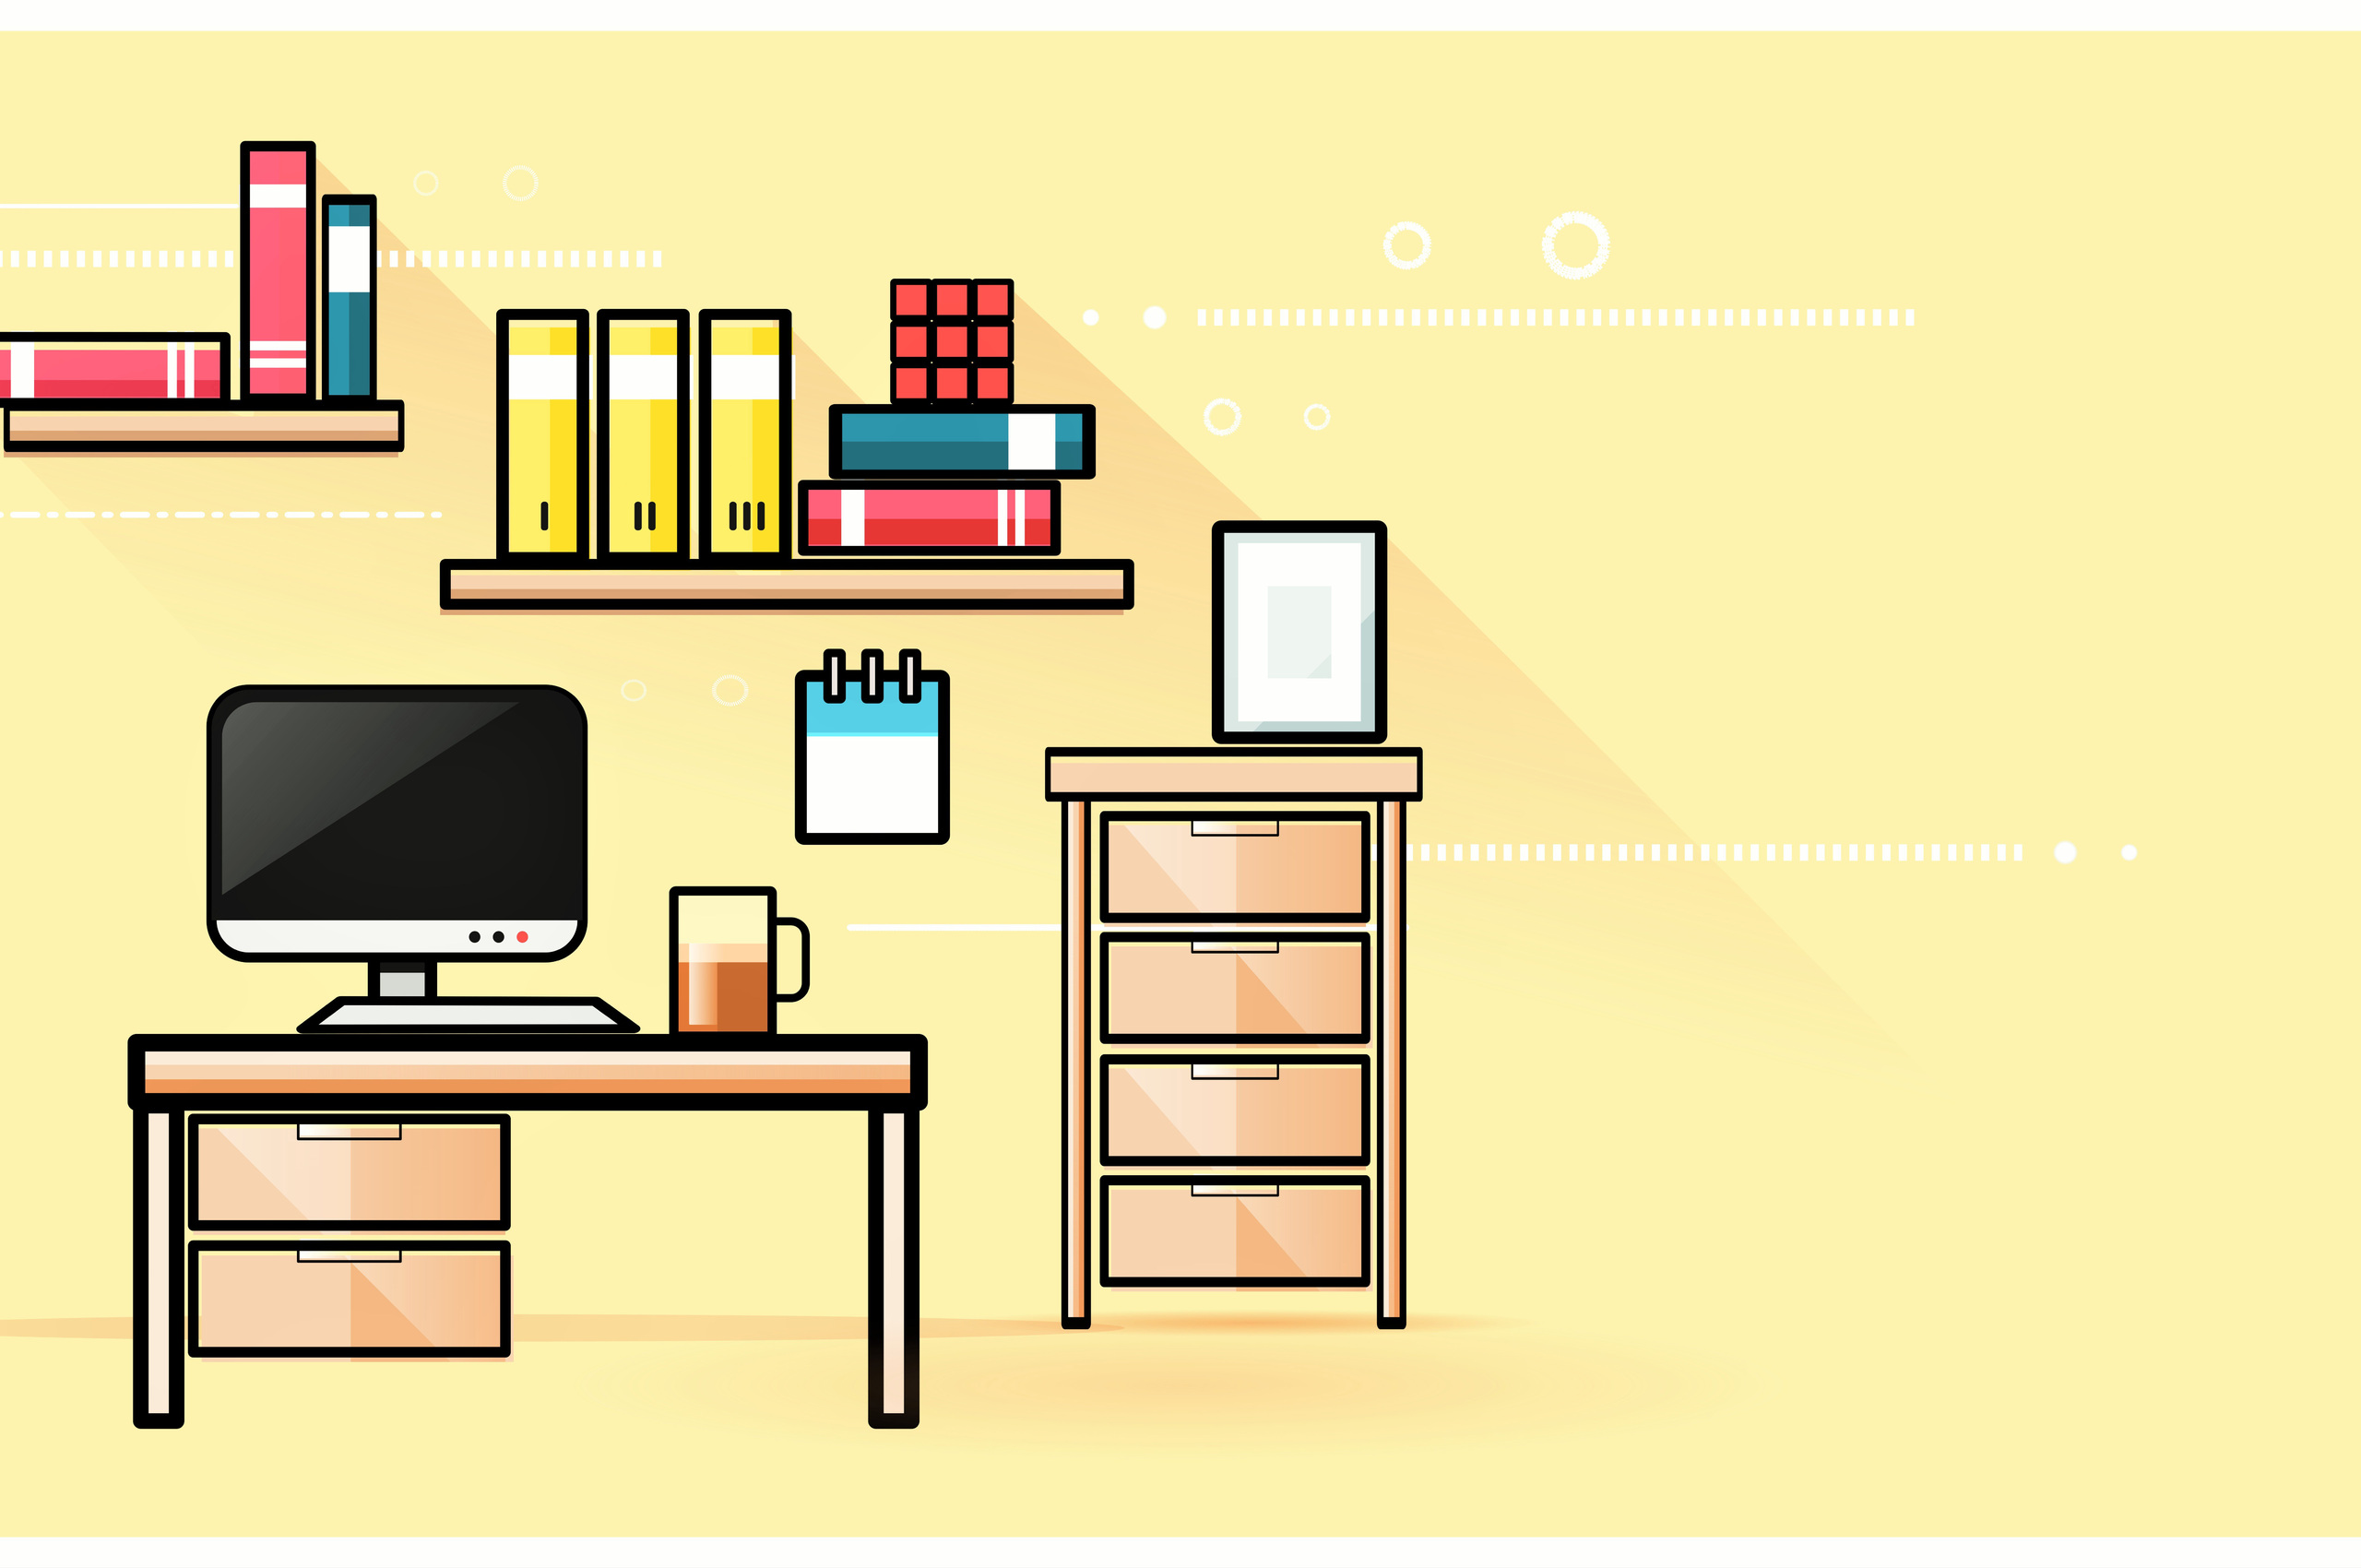 student-workstation-desk-computer-books-minimalism-10k-66.jpg